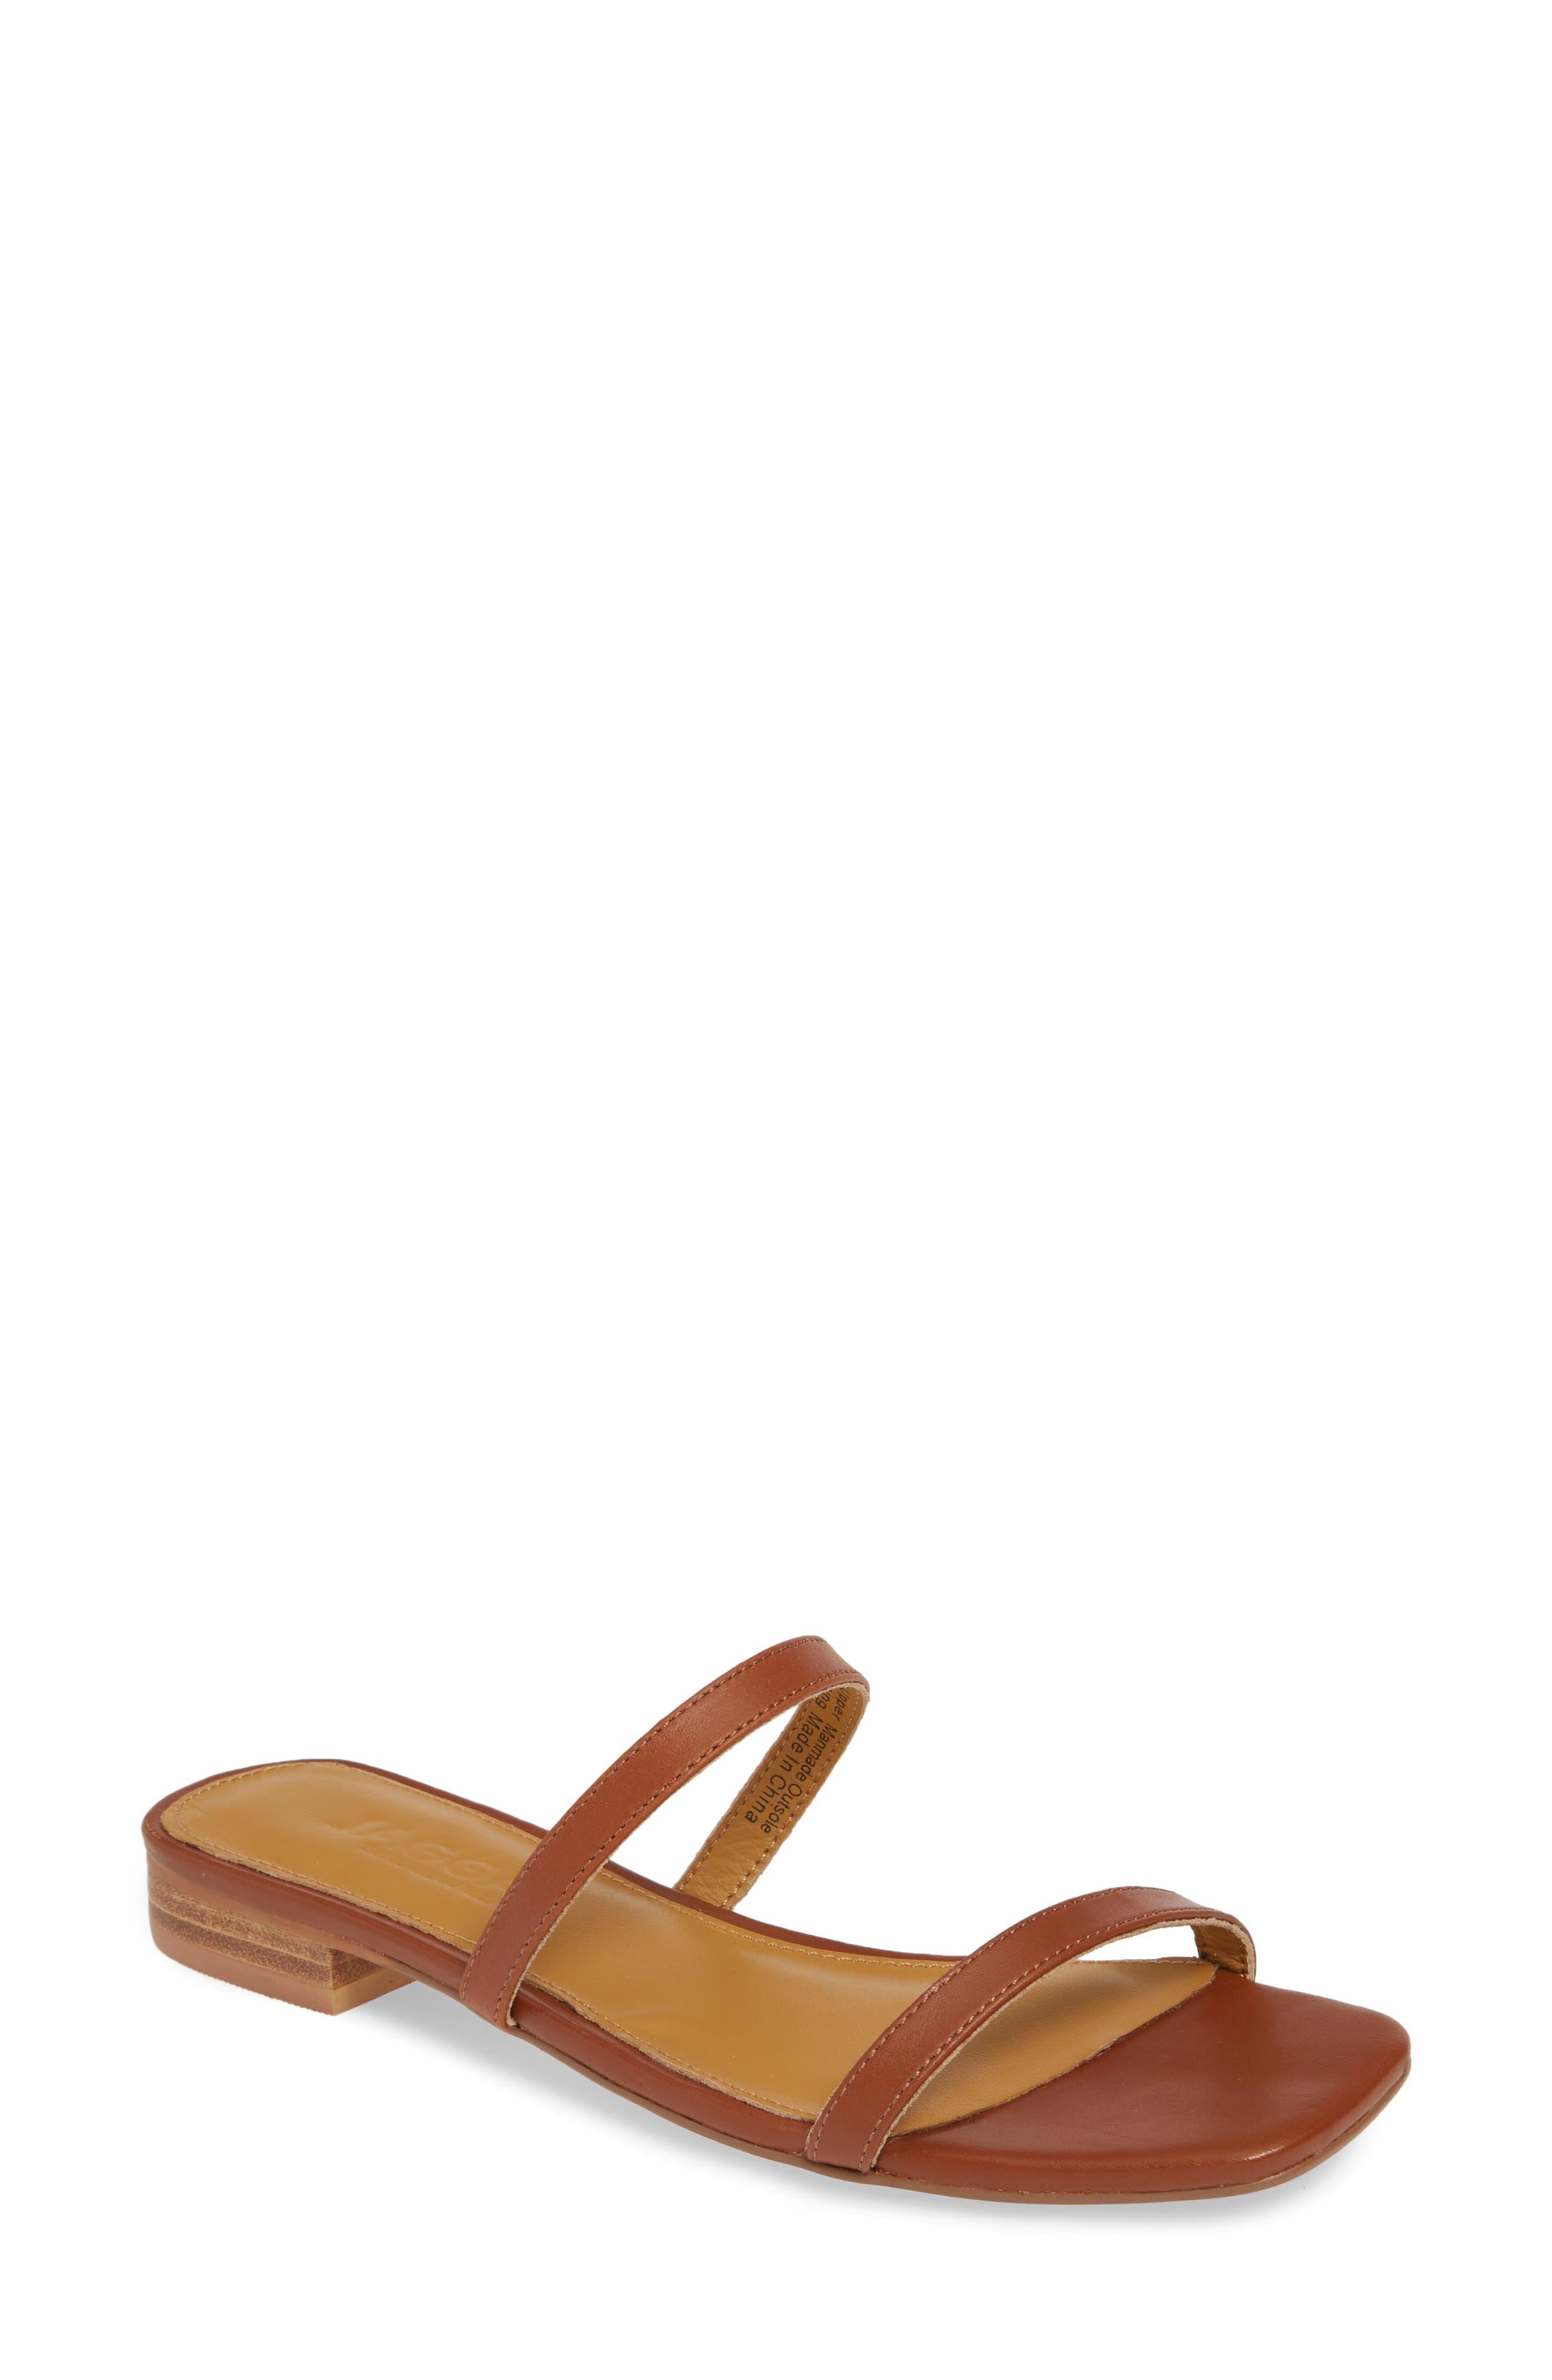 JAGGAR, Sprung Slide Sandal, Main thumbnail 1, color, RUST LEATHER